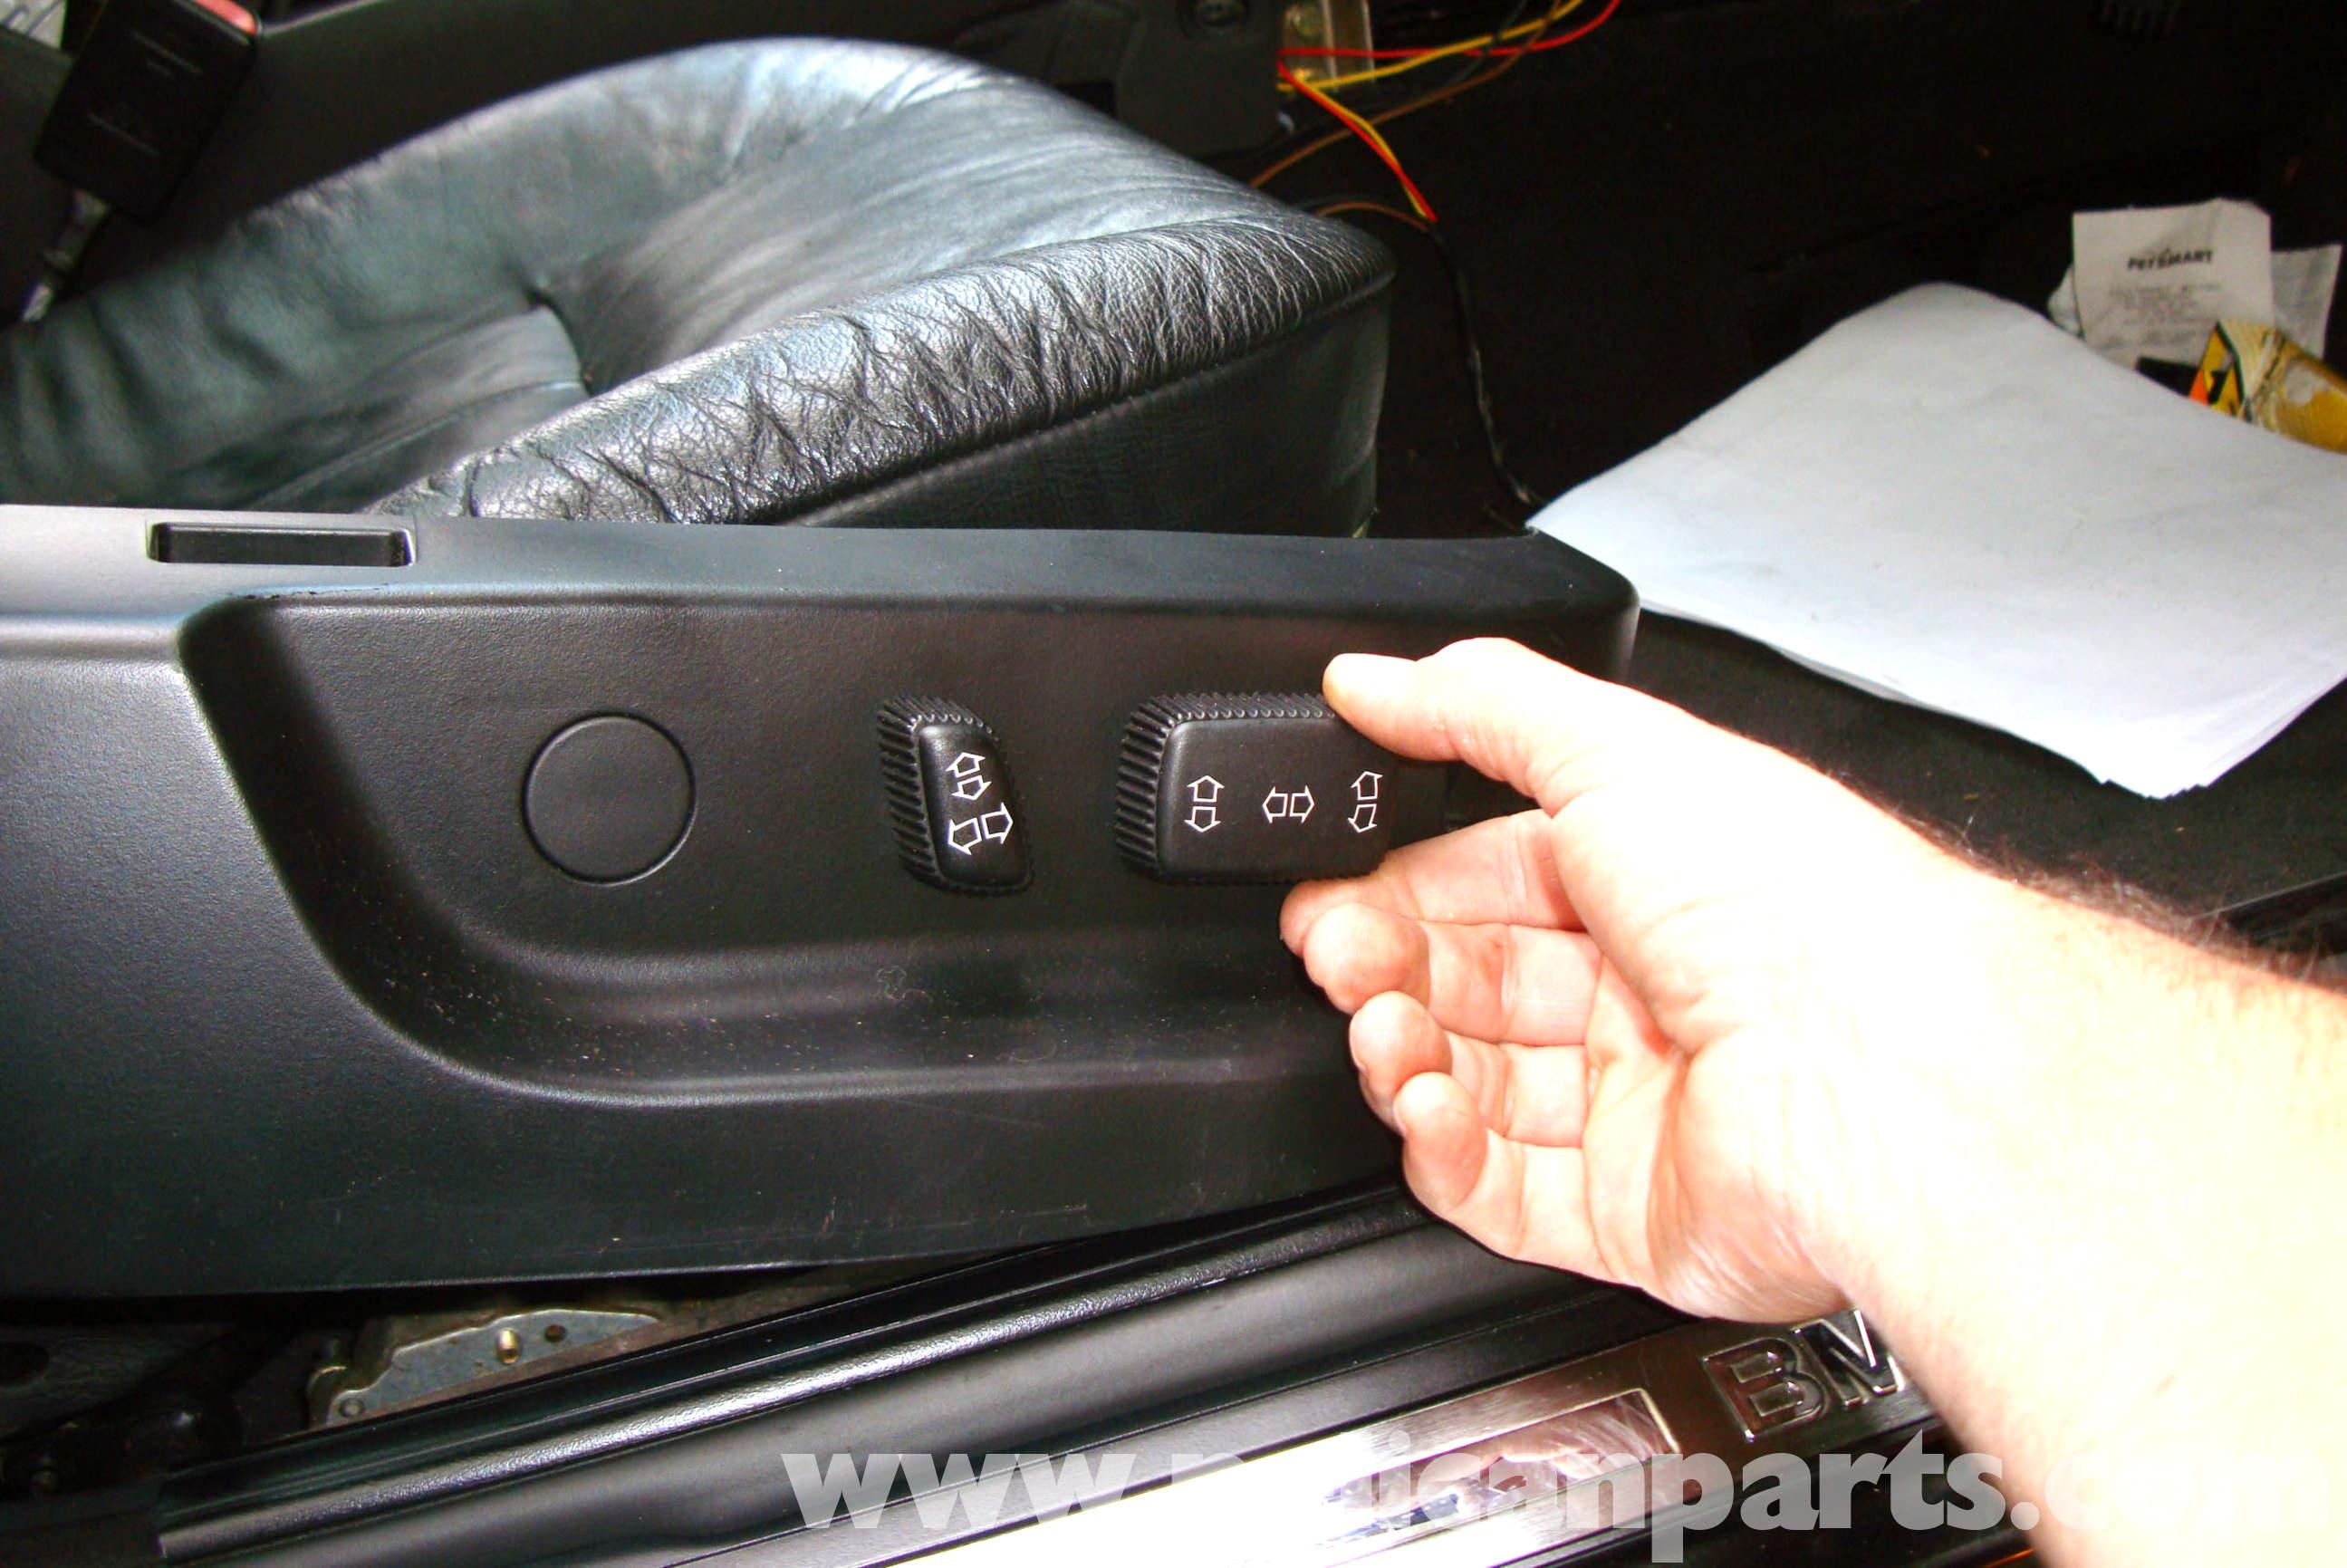 Bmw E39 5 Series Power Seat Testing 1997 2003 525i 528i 530i Electrical Wiring Diagram 760 Large Image Extra